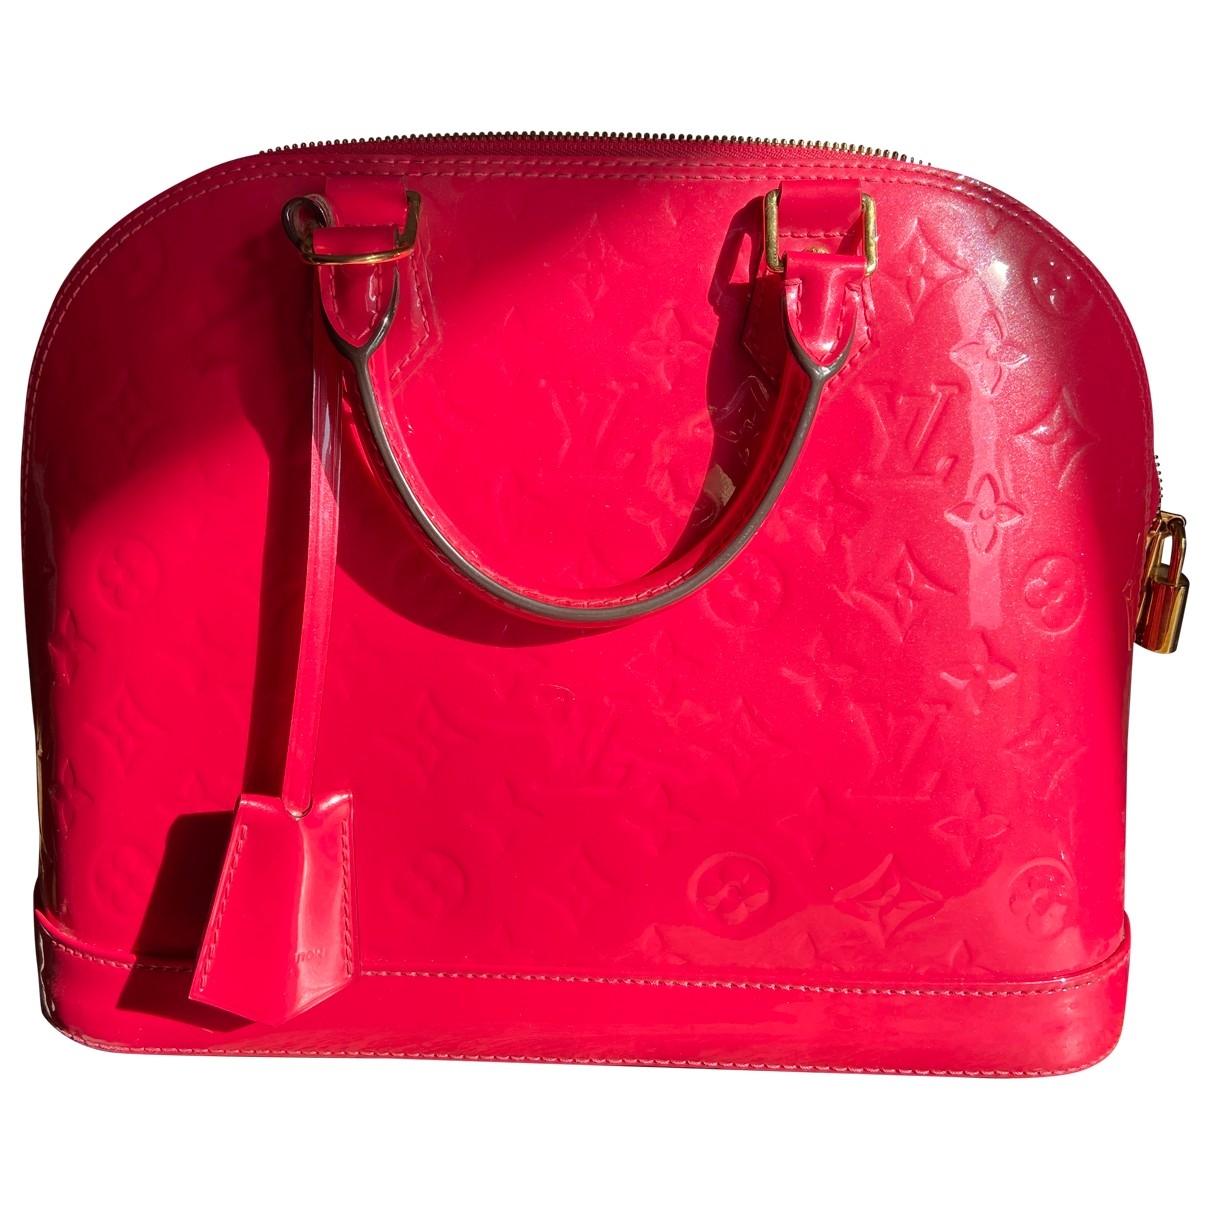 Louis Vuitton Alma Handtasche in  Rosa Lackleder